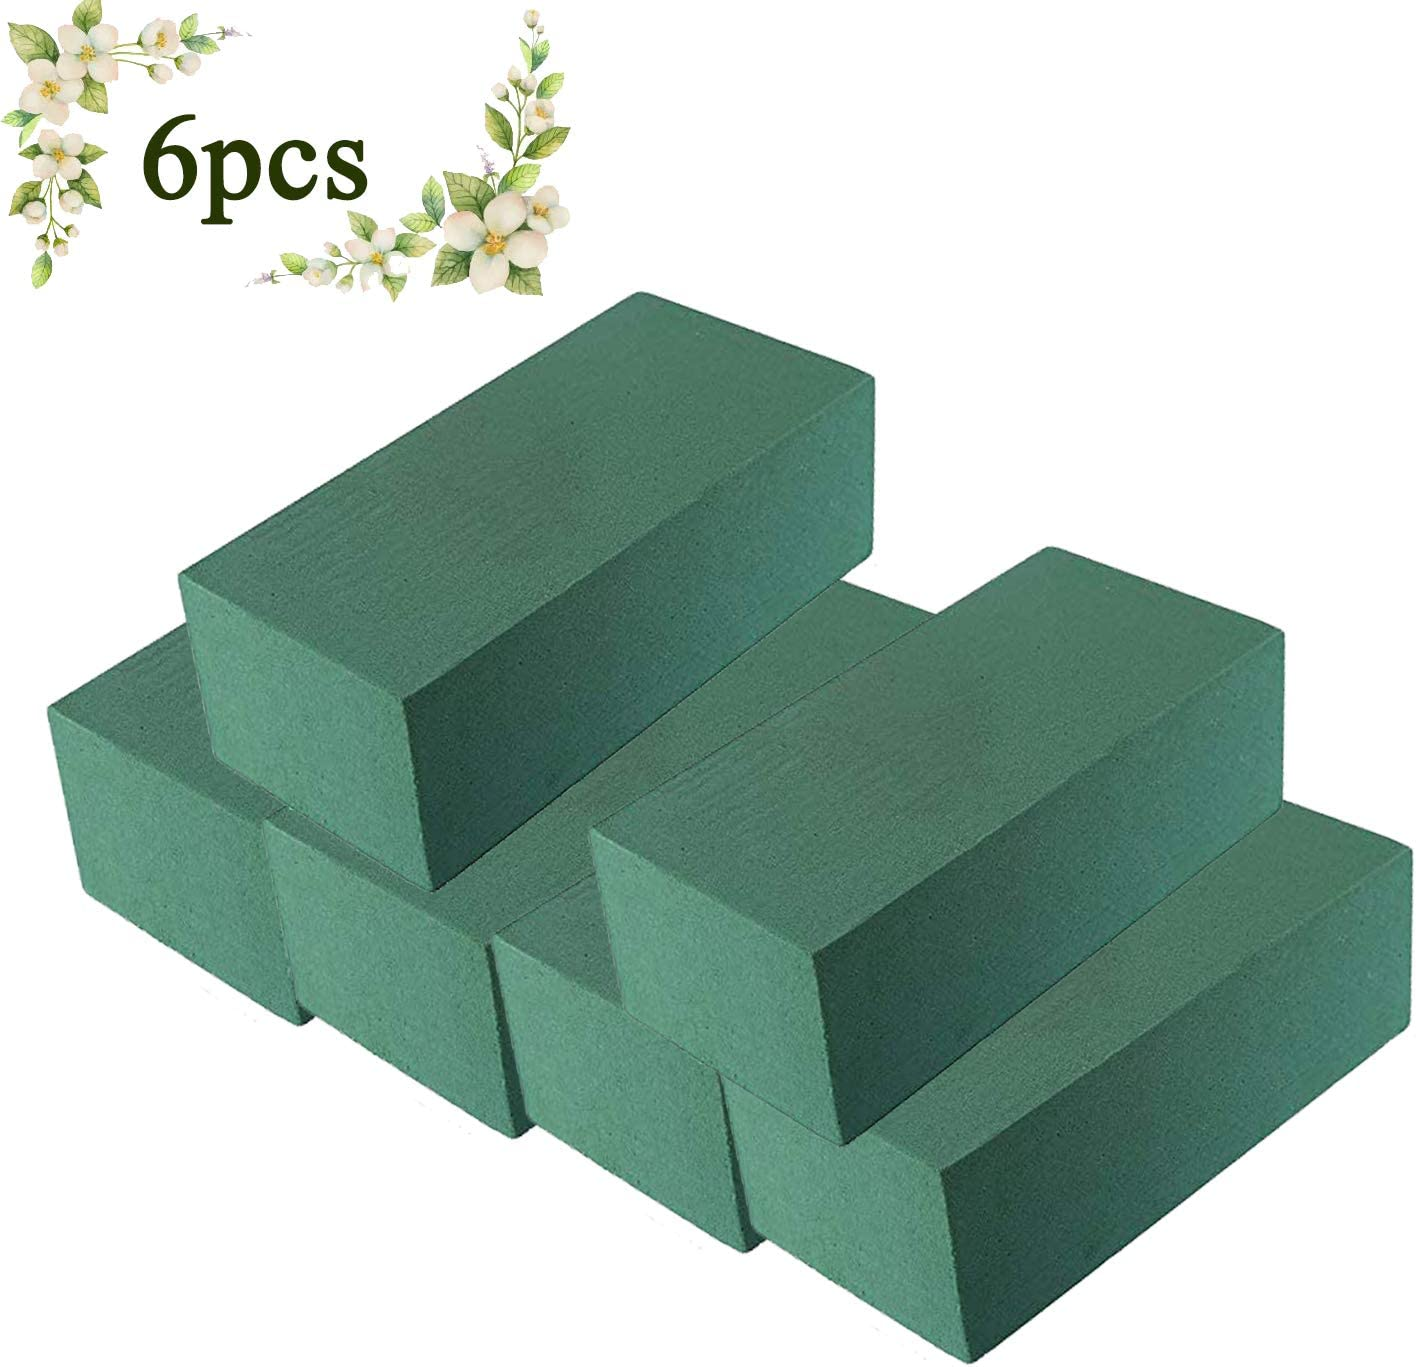 FINGOOO 6 Pack Wet Floral Foam Blocks Florist Flower Styrofoam Green Bricks Applied for Crafts or Flowers Arrangement Green